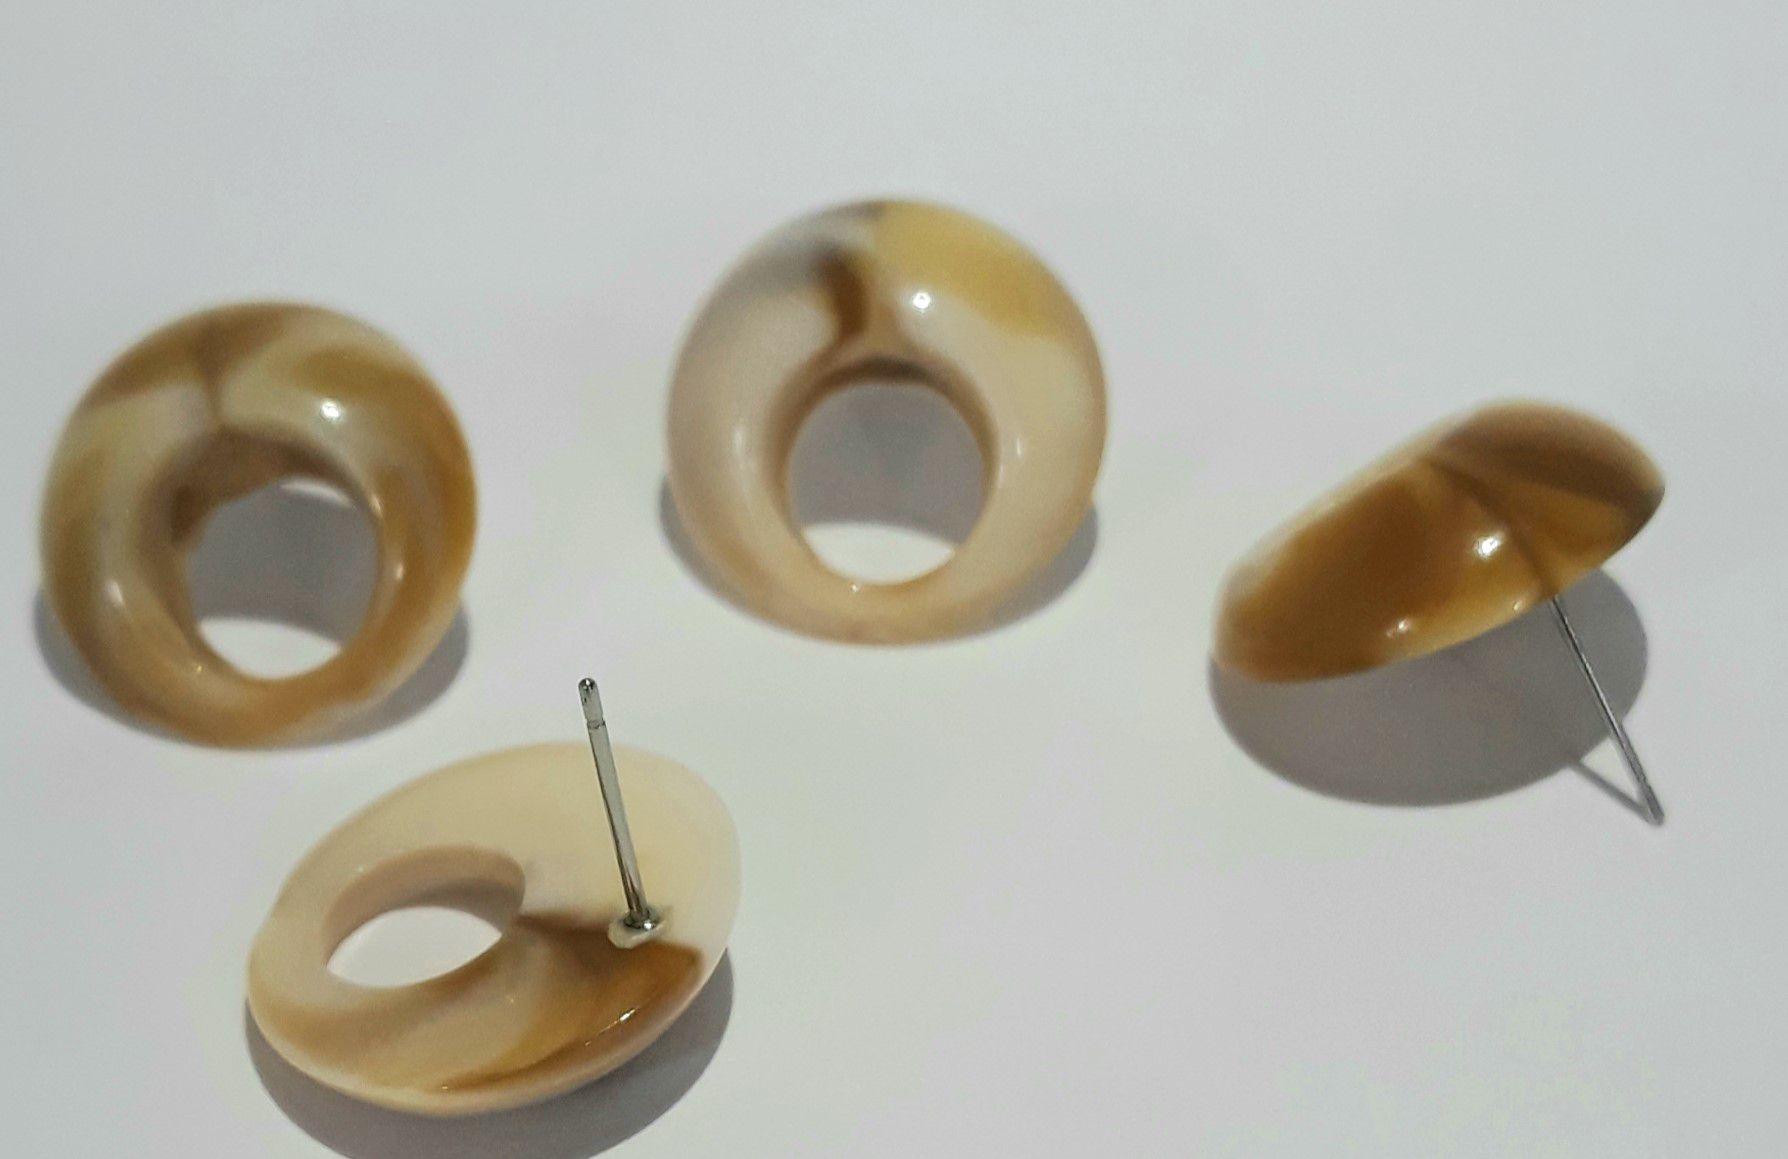 Brinco de Resina - RESB04